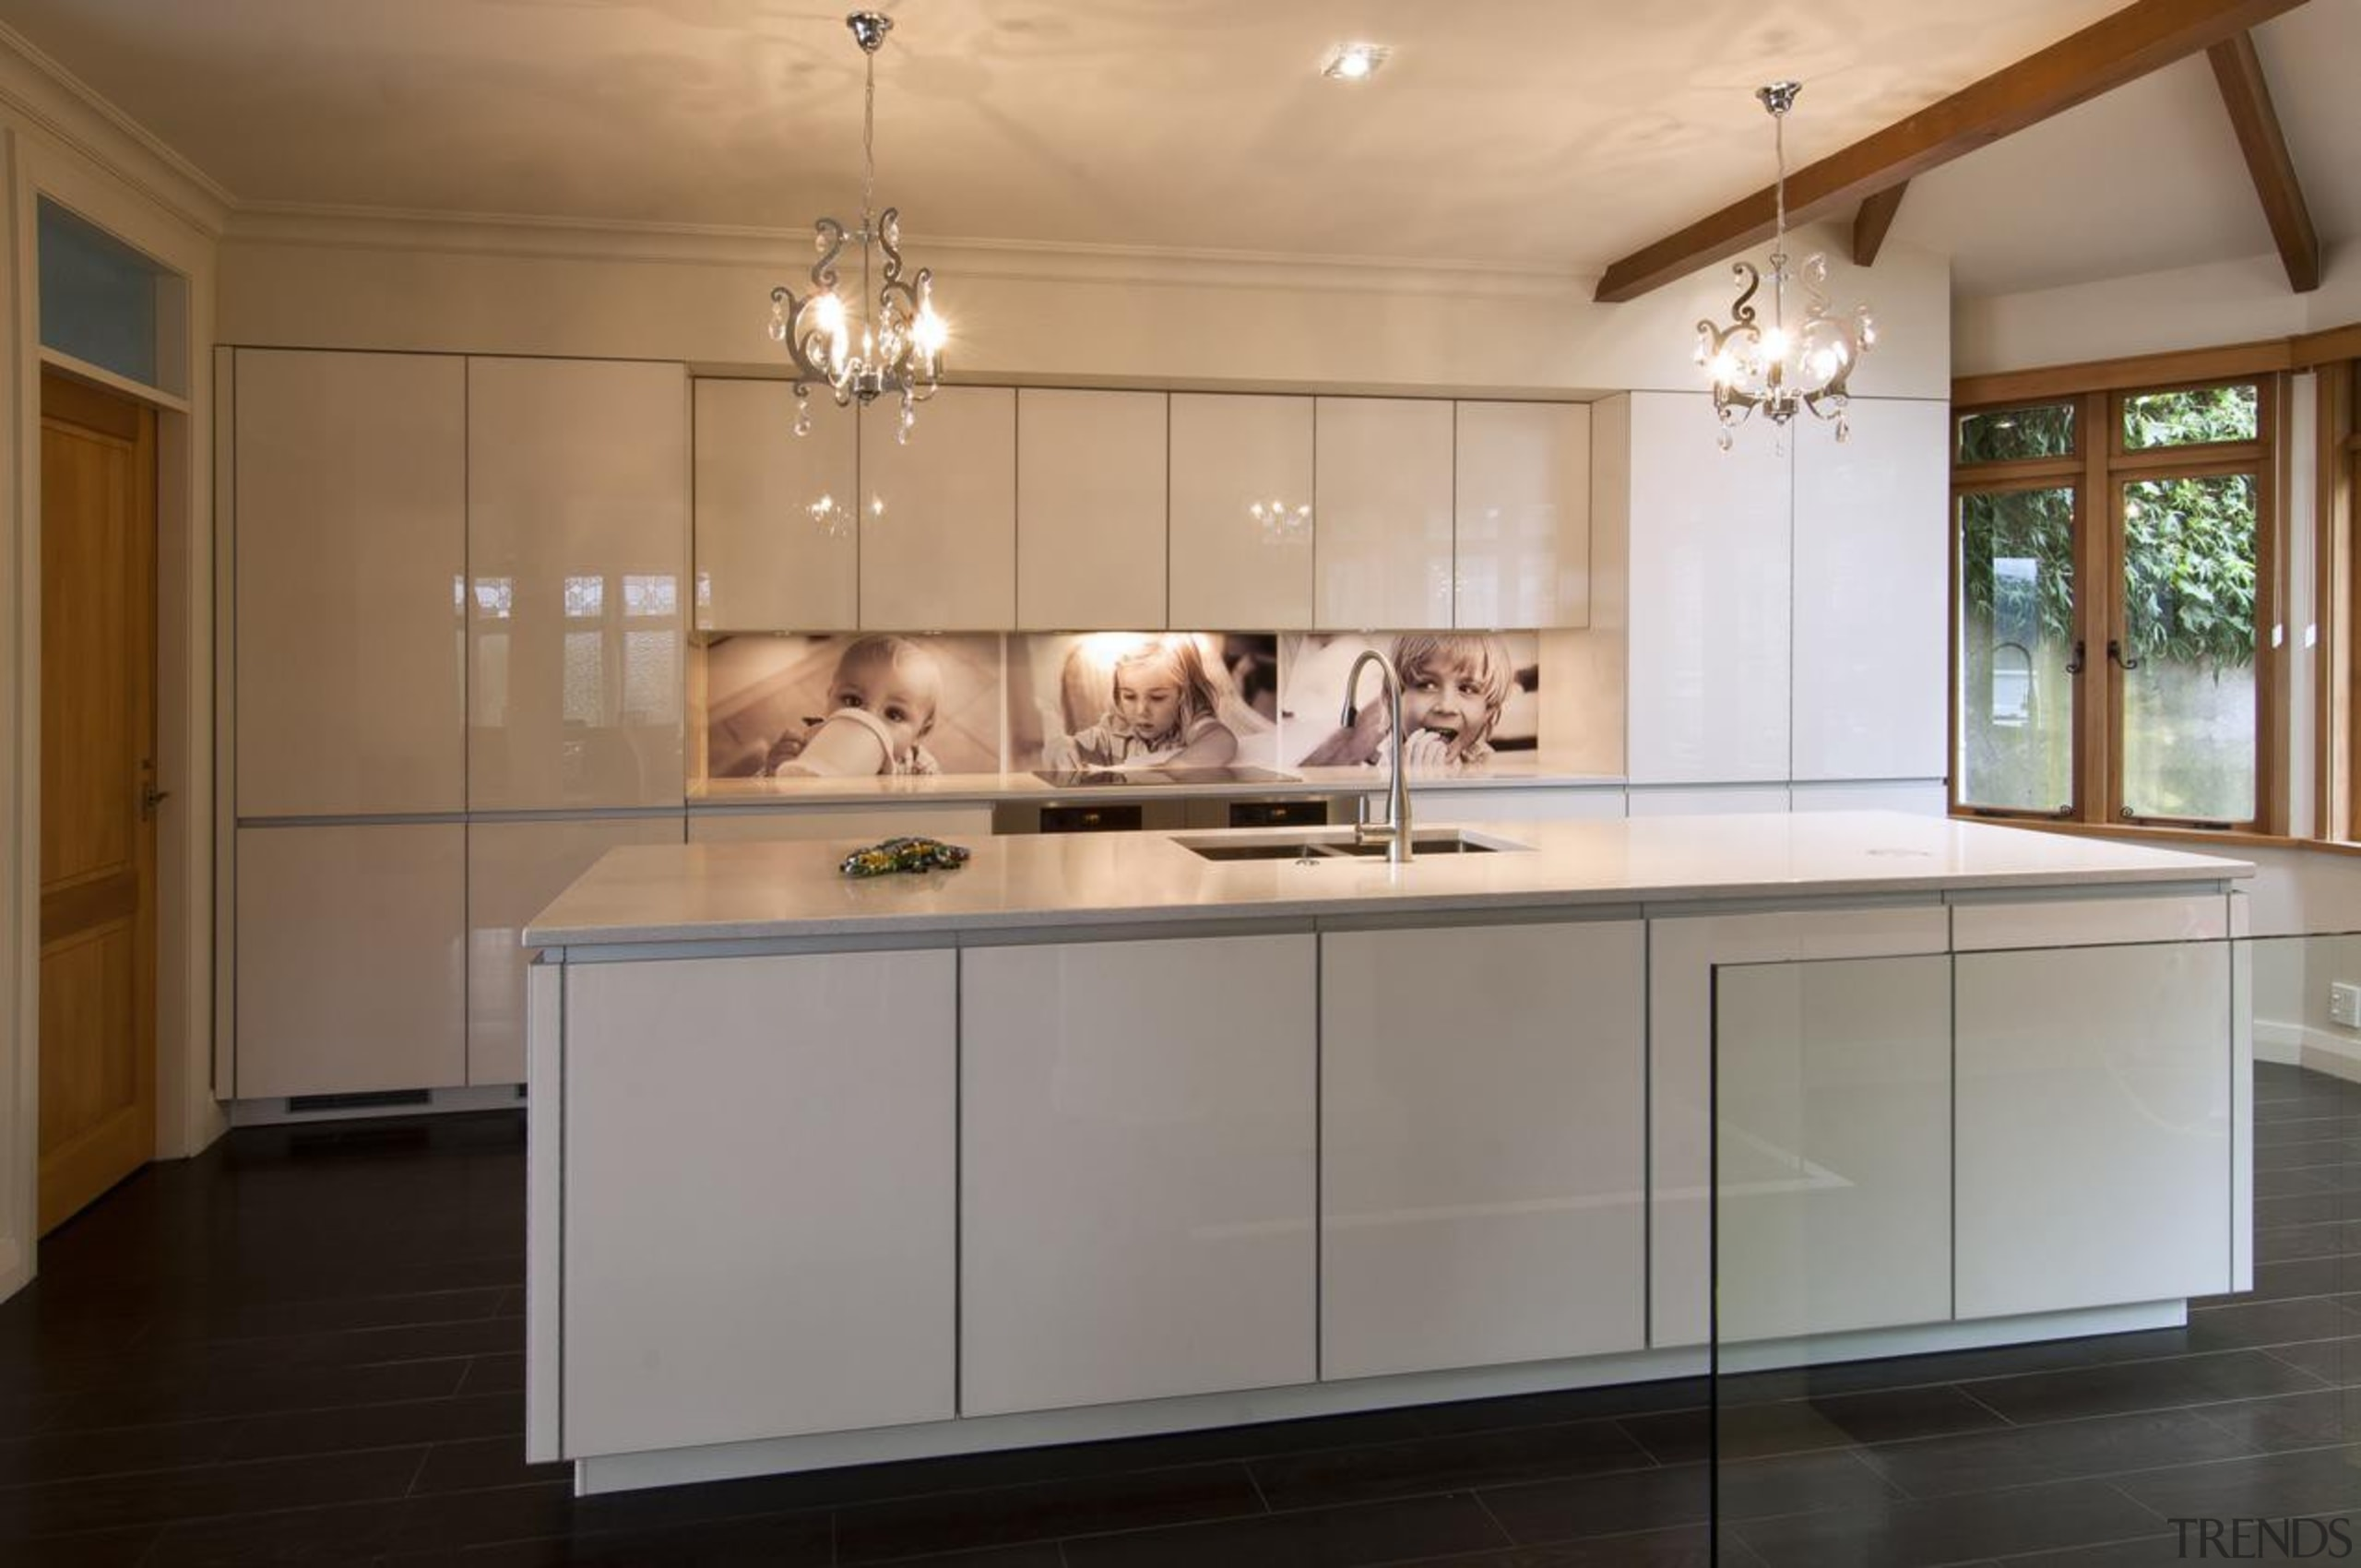 Hataitai Kitchen - Hataitai Kitchen - cabinetry | cabinetry, countertop, cuisine classique, interior design, kitchen, room, gray, brown